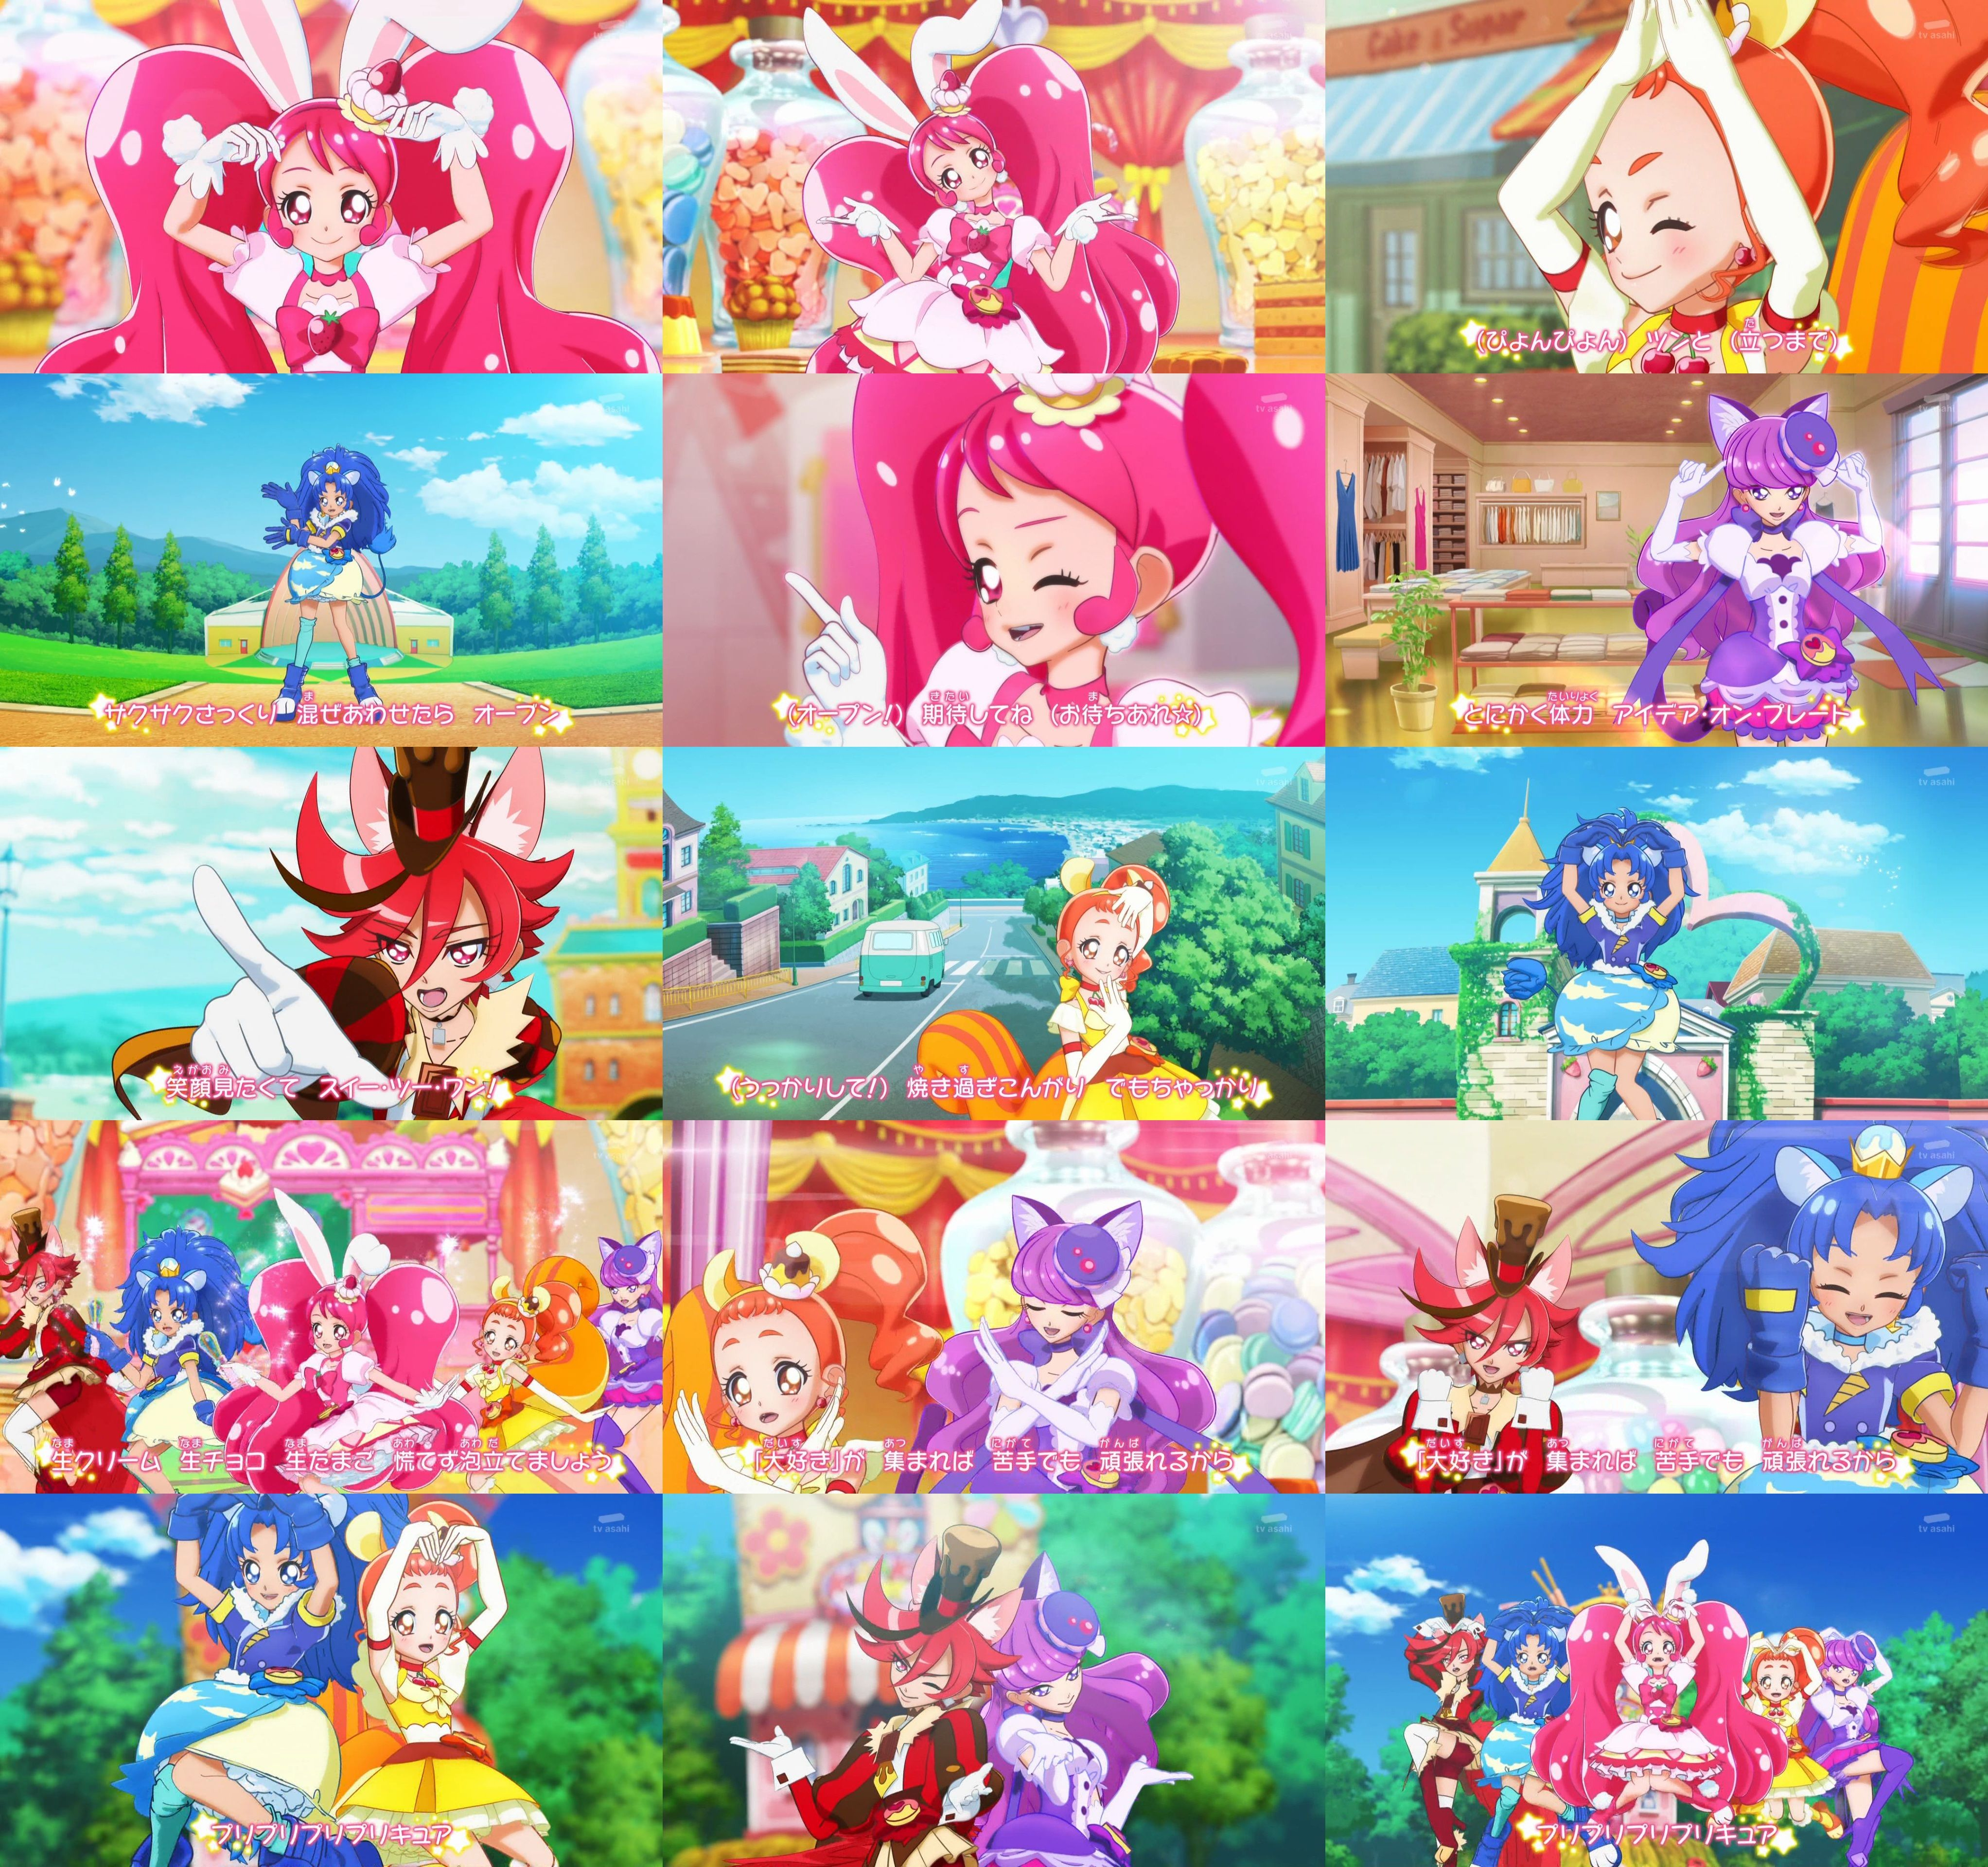 kirakira precure a la mode 1 ending pretty cure pretty and cute anime